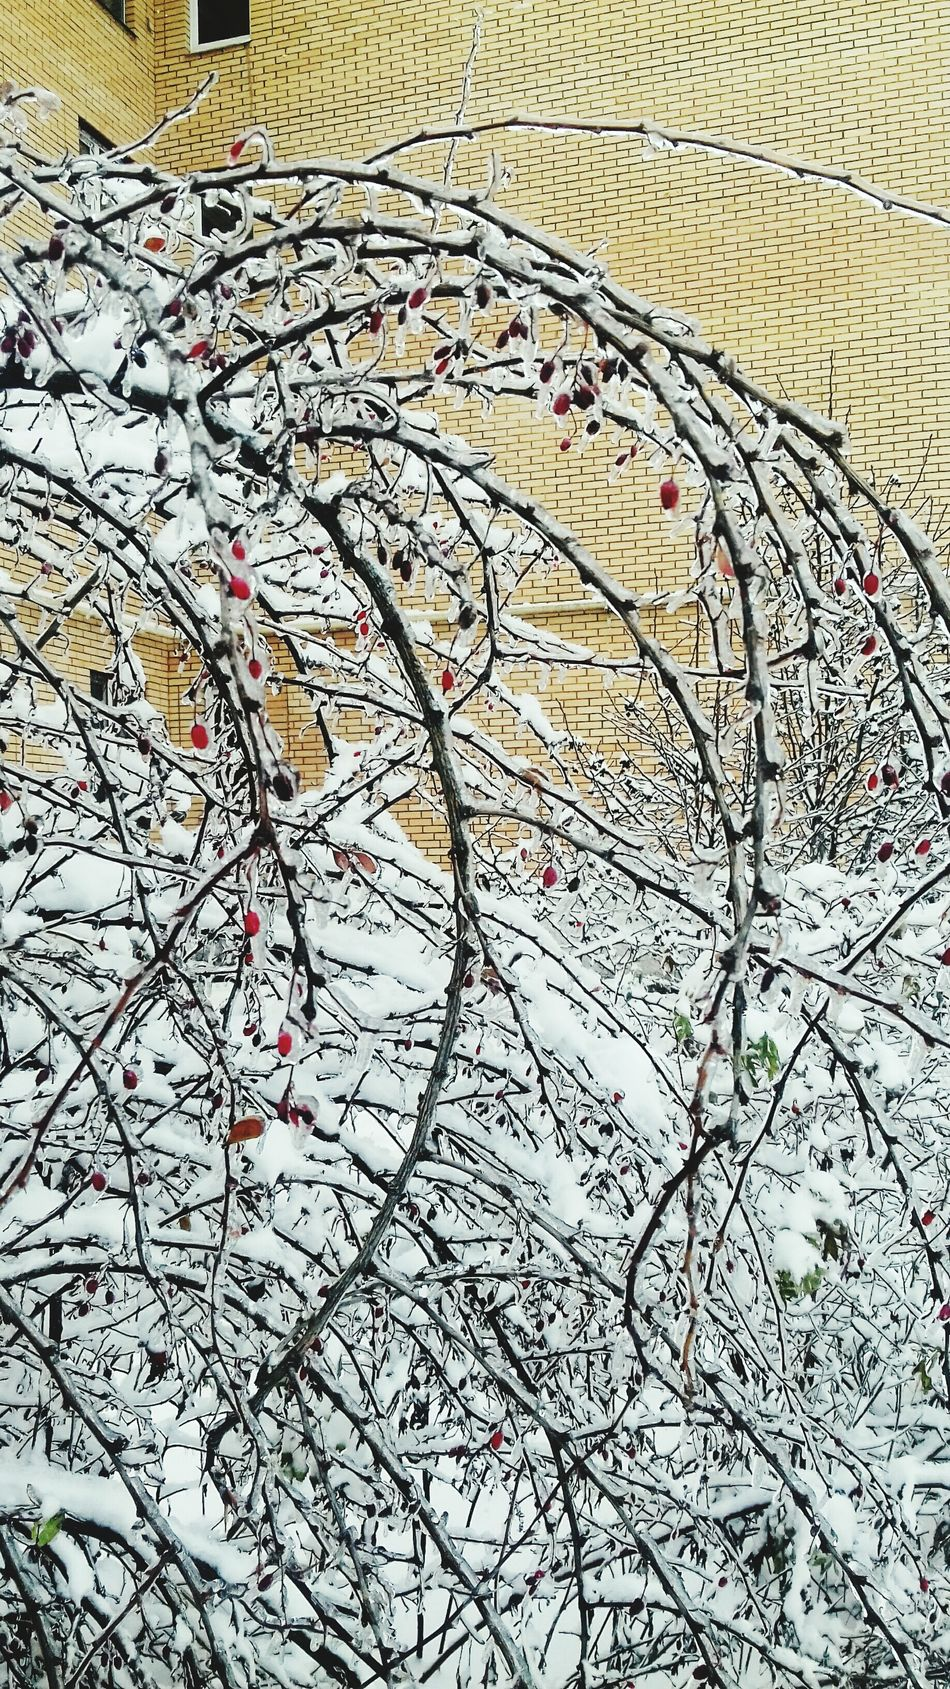 Рання осень в Москве No People Full Frame Outdoors Close-up Backgrounds Day Nature